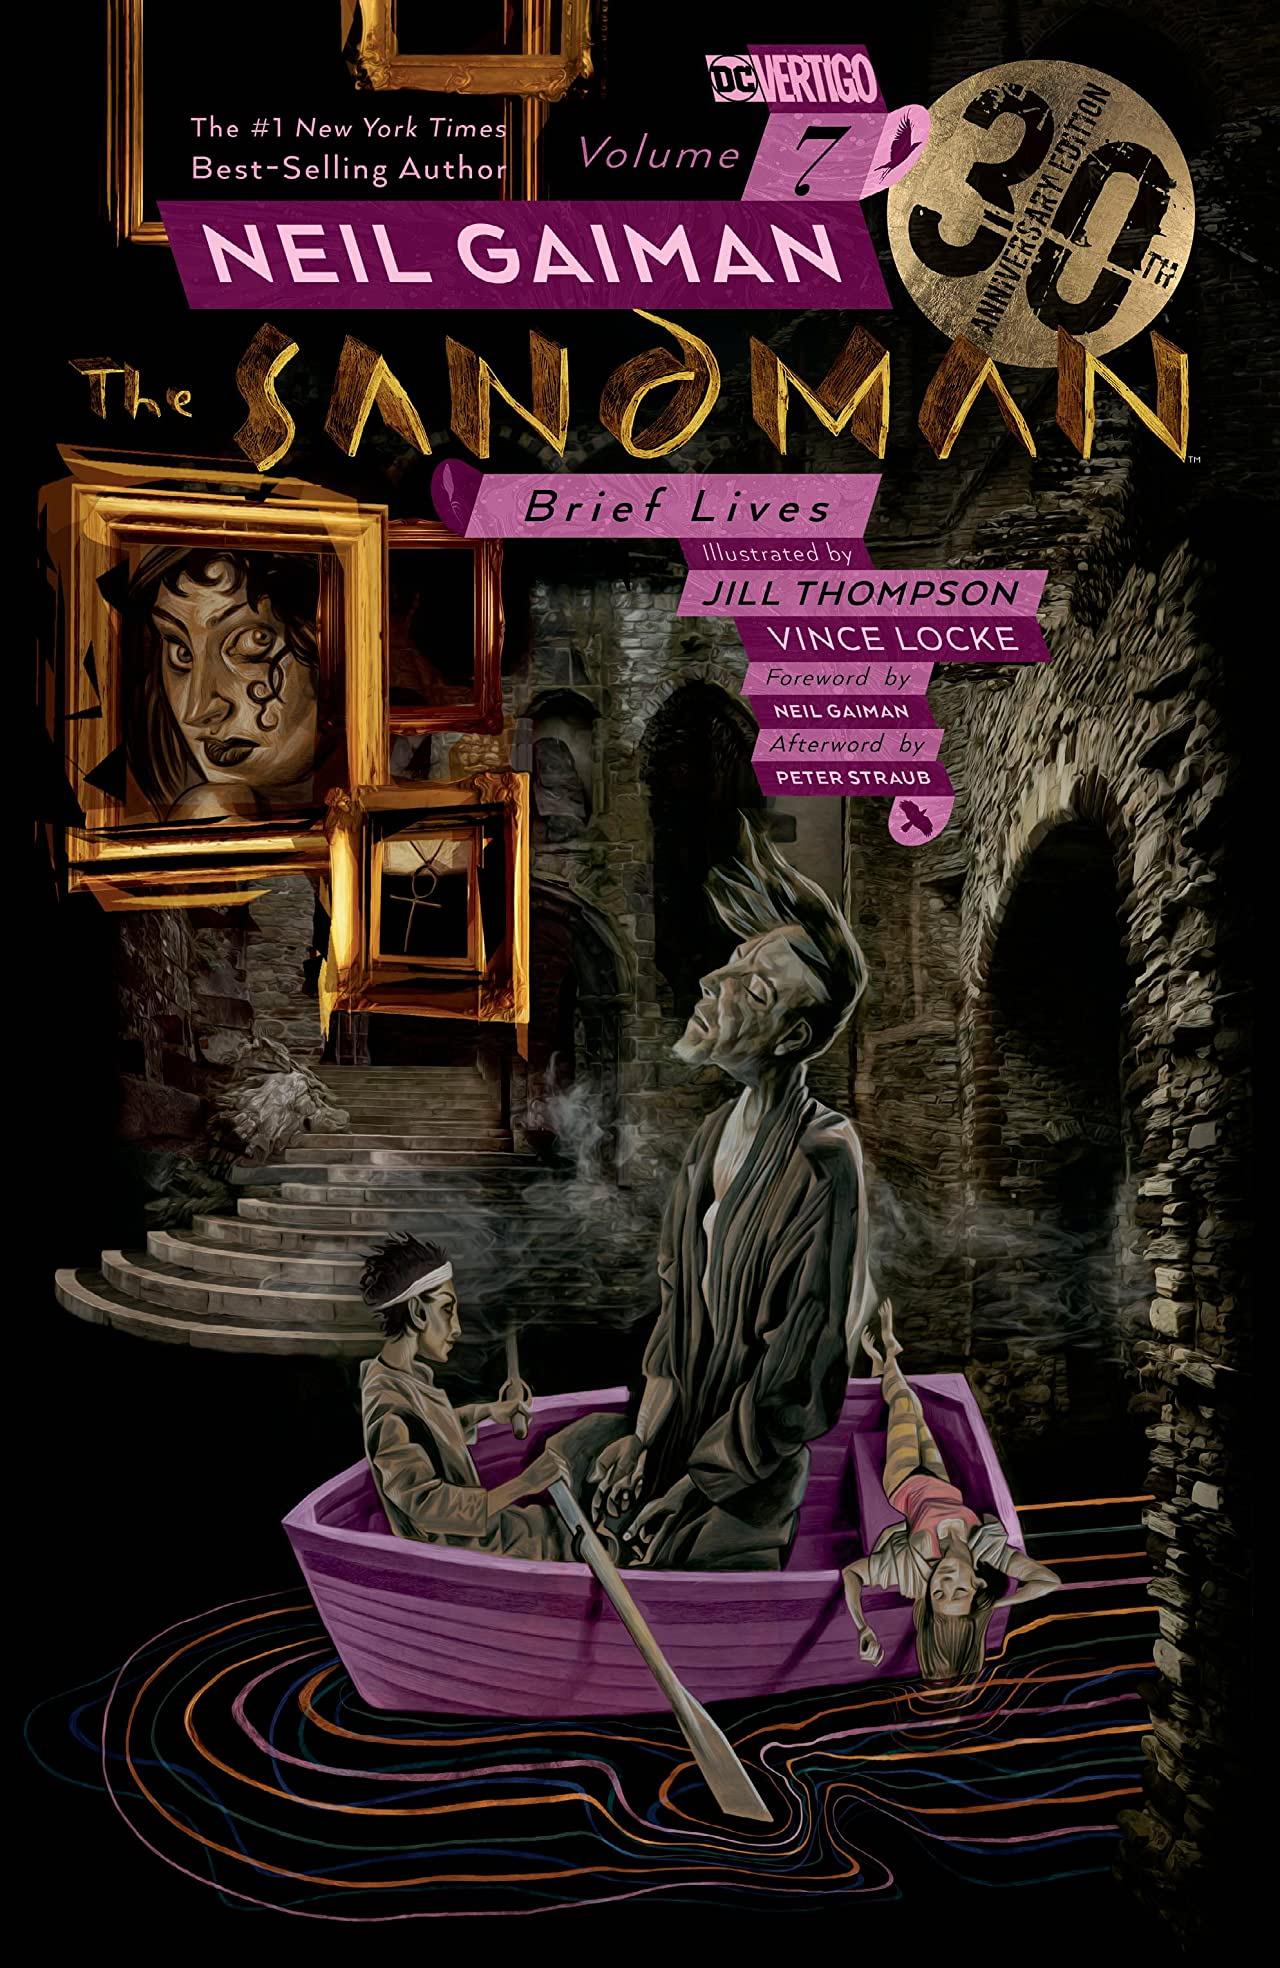 The Sandman, Vol. 7: Brief Lives - 30th Anniversary Edition by Neil Gaiman